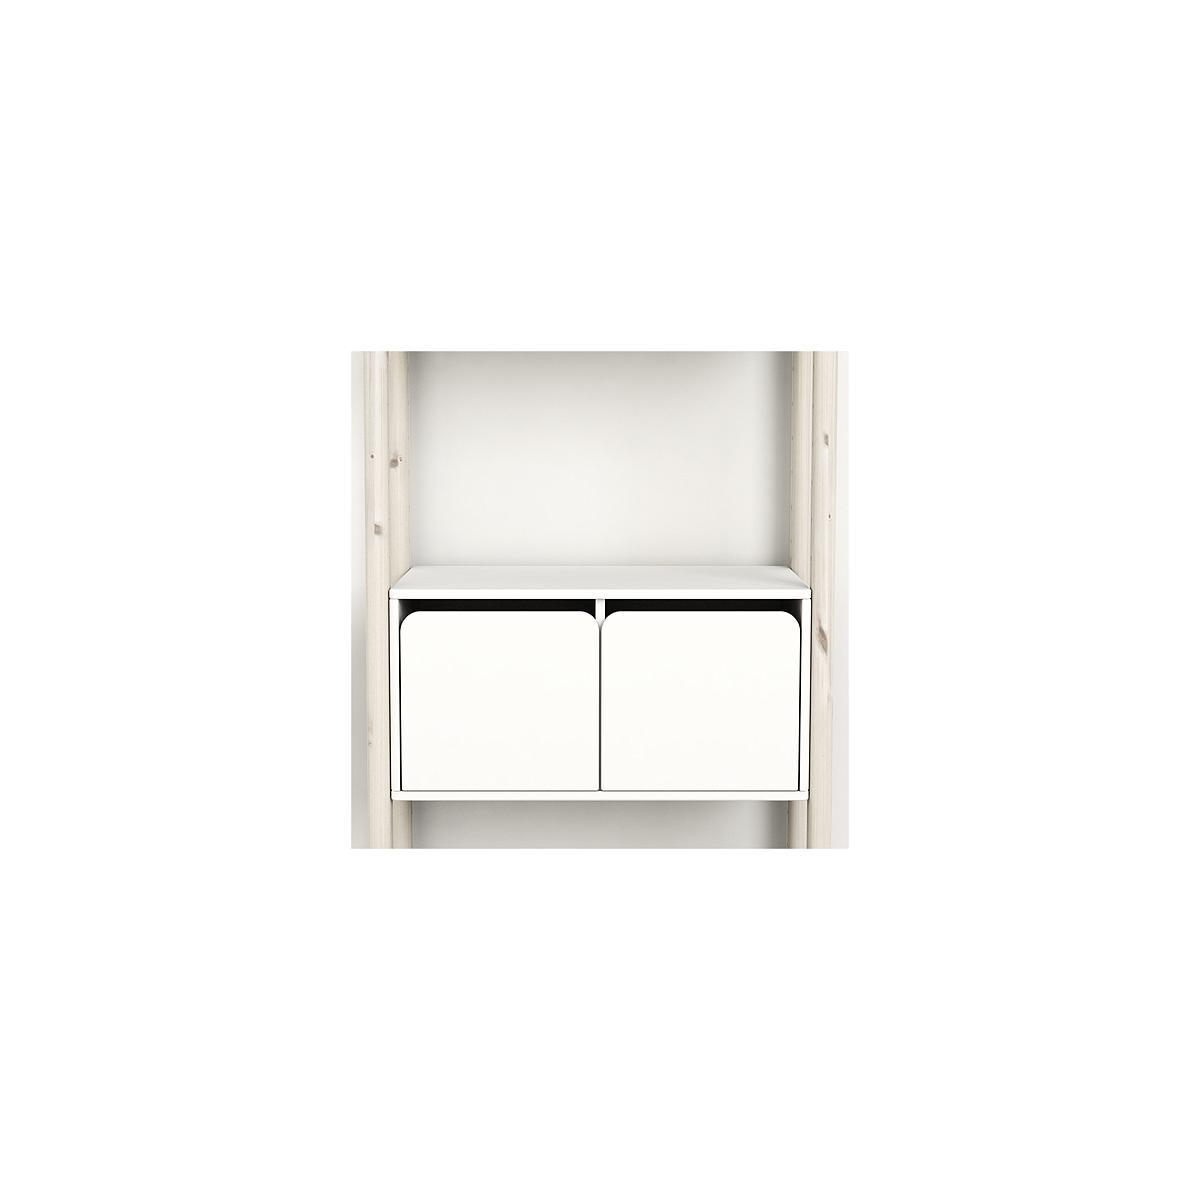 SHELFIE Midi C by Flexa Rangement 131 cm Blanc blanchi